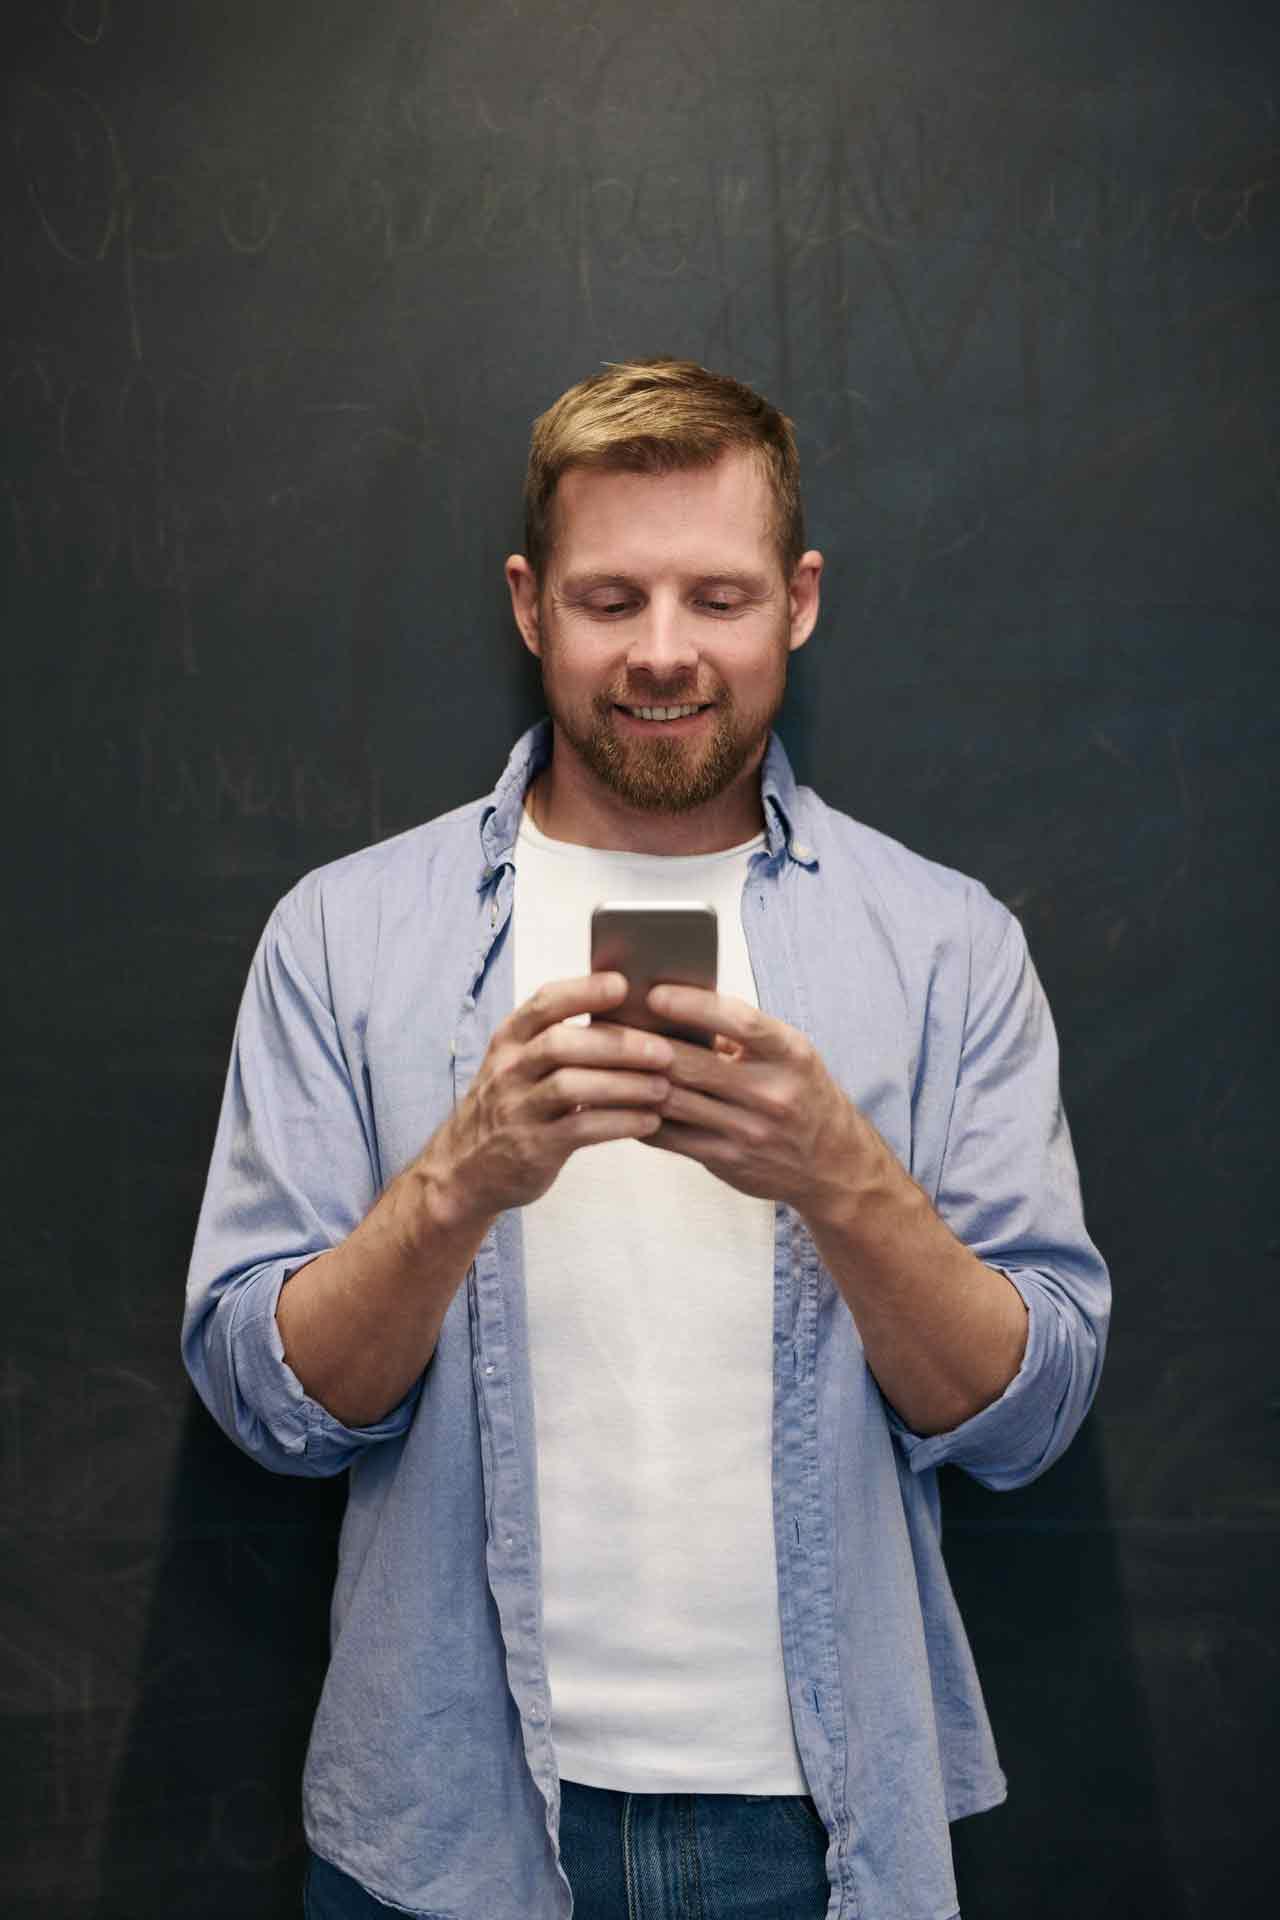 photo-of-man-using-smartphone-3183191